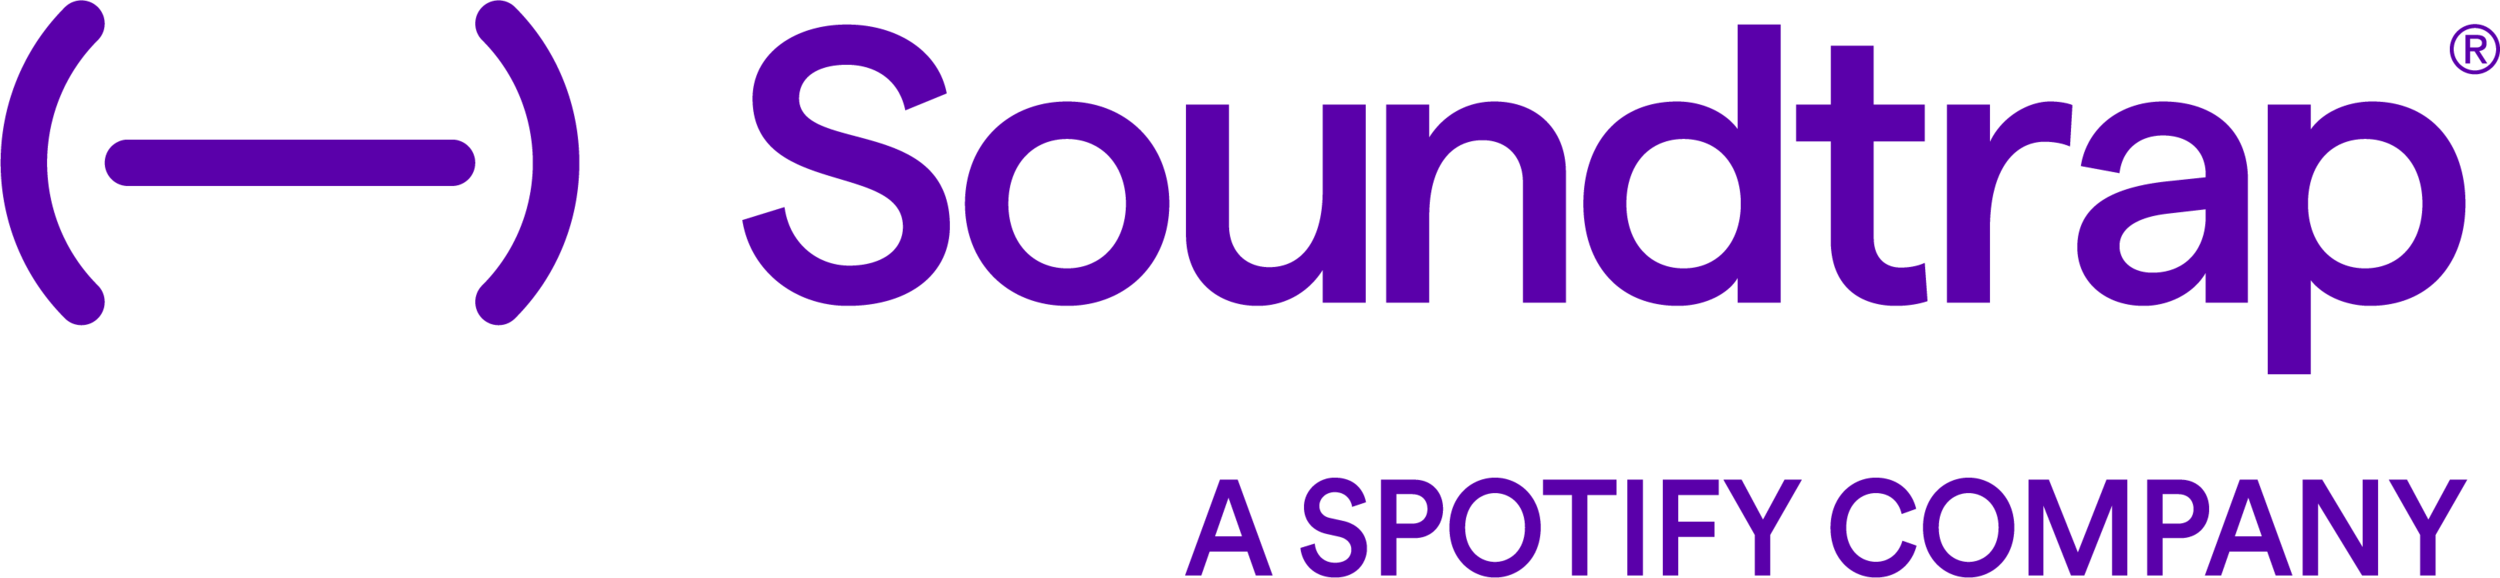 soundtrap_spotify_purple_vertical.png